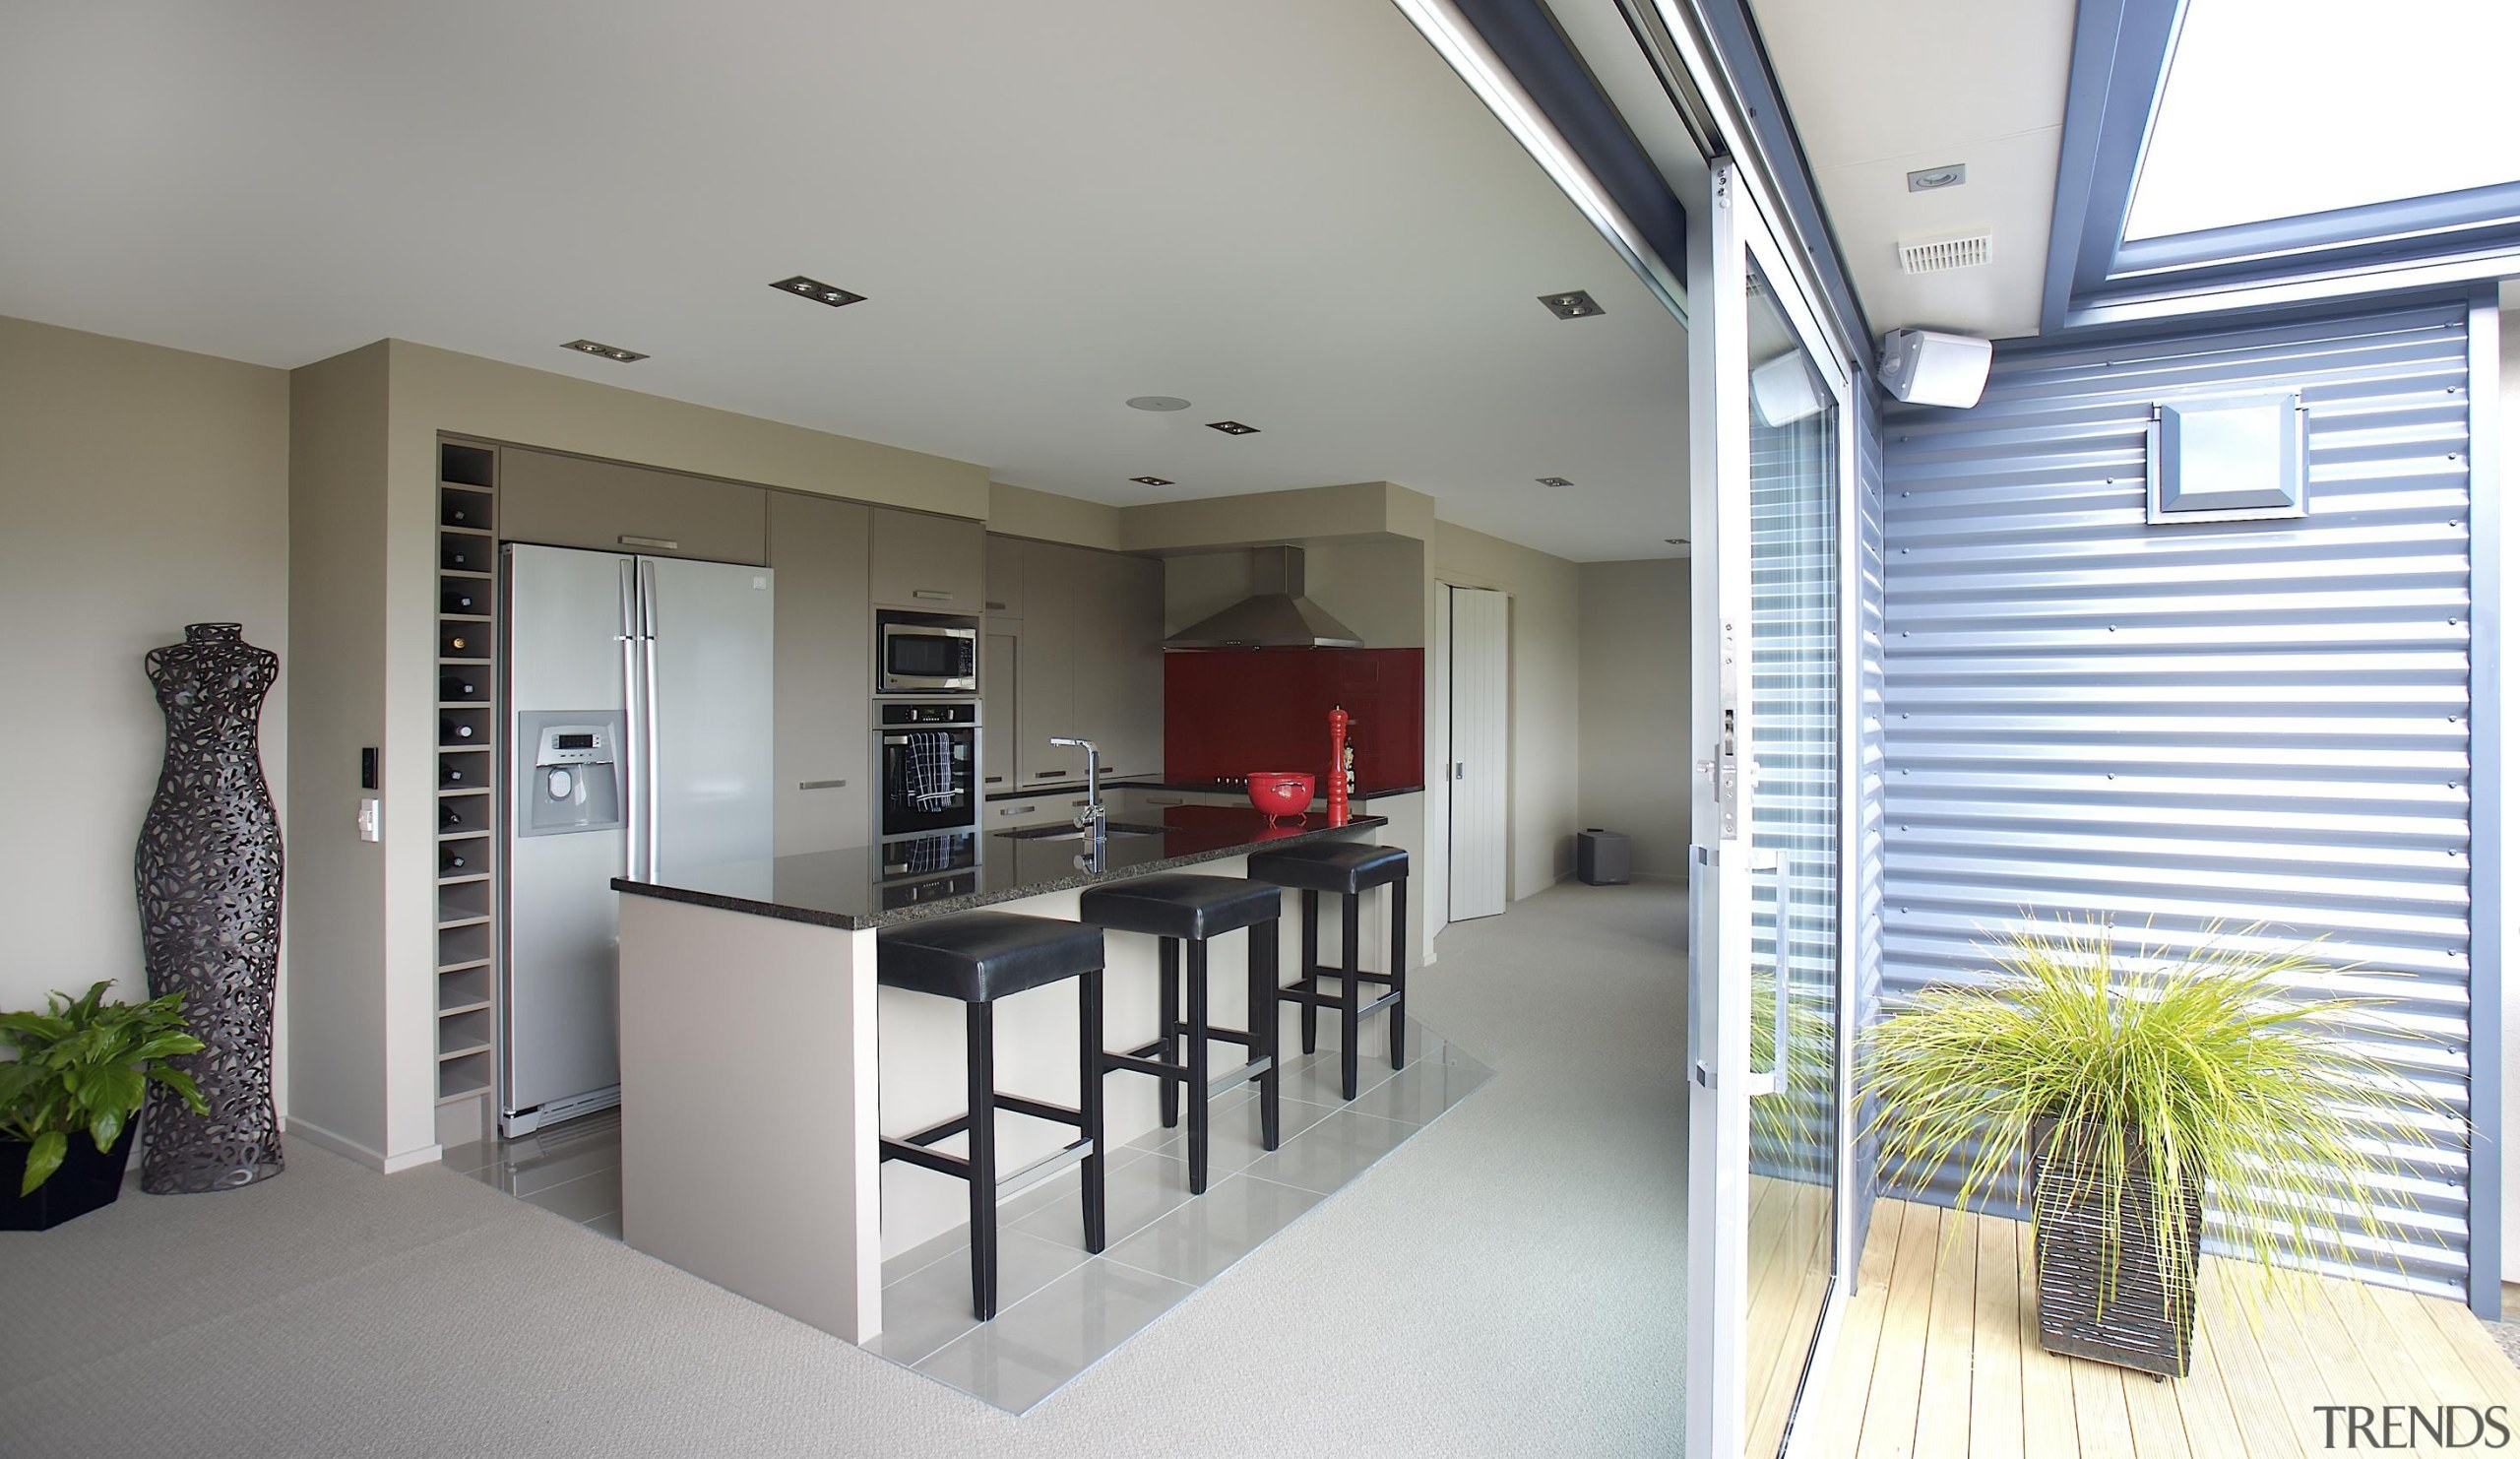 For more information, please  visit www.gjgardner.co.nz daylighting, door, house, interior design, property, real estate, window, gray, white